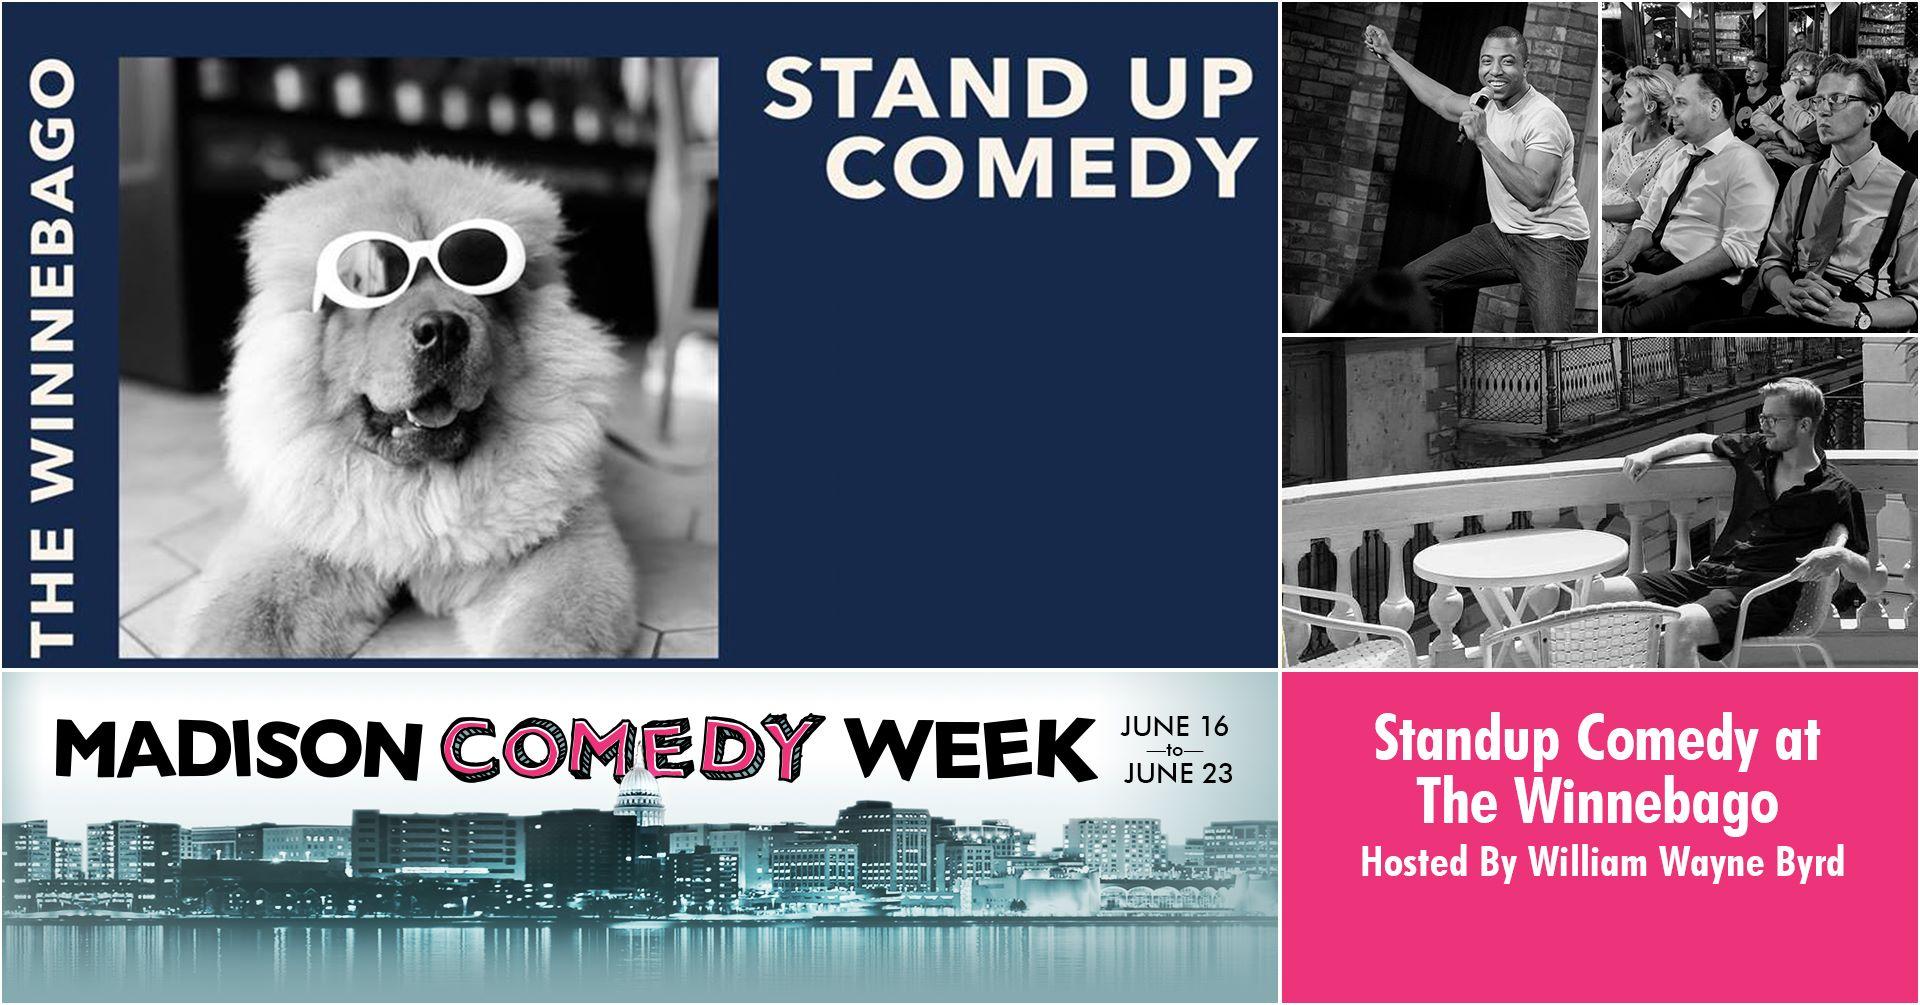 standupcomedyweek.jpg